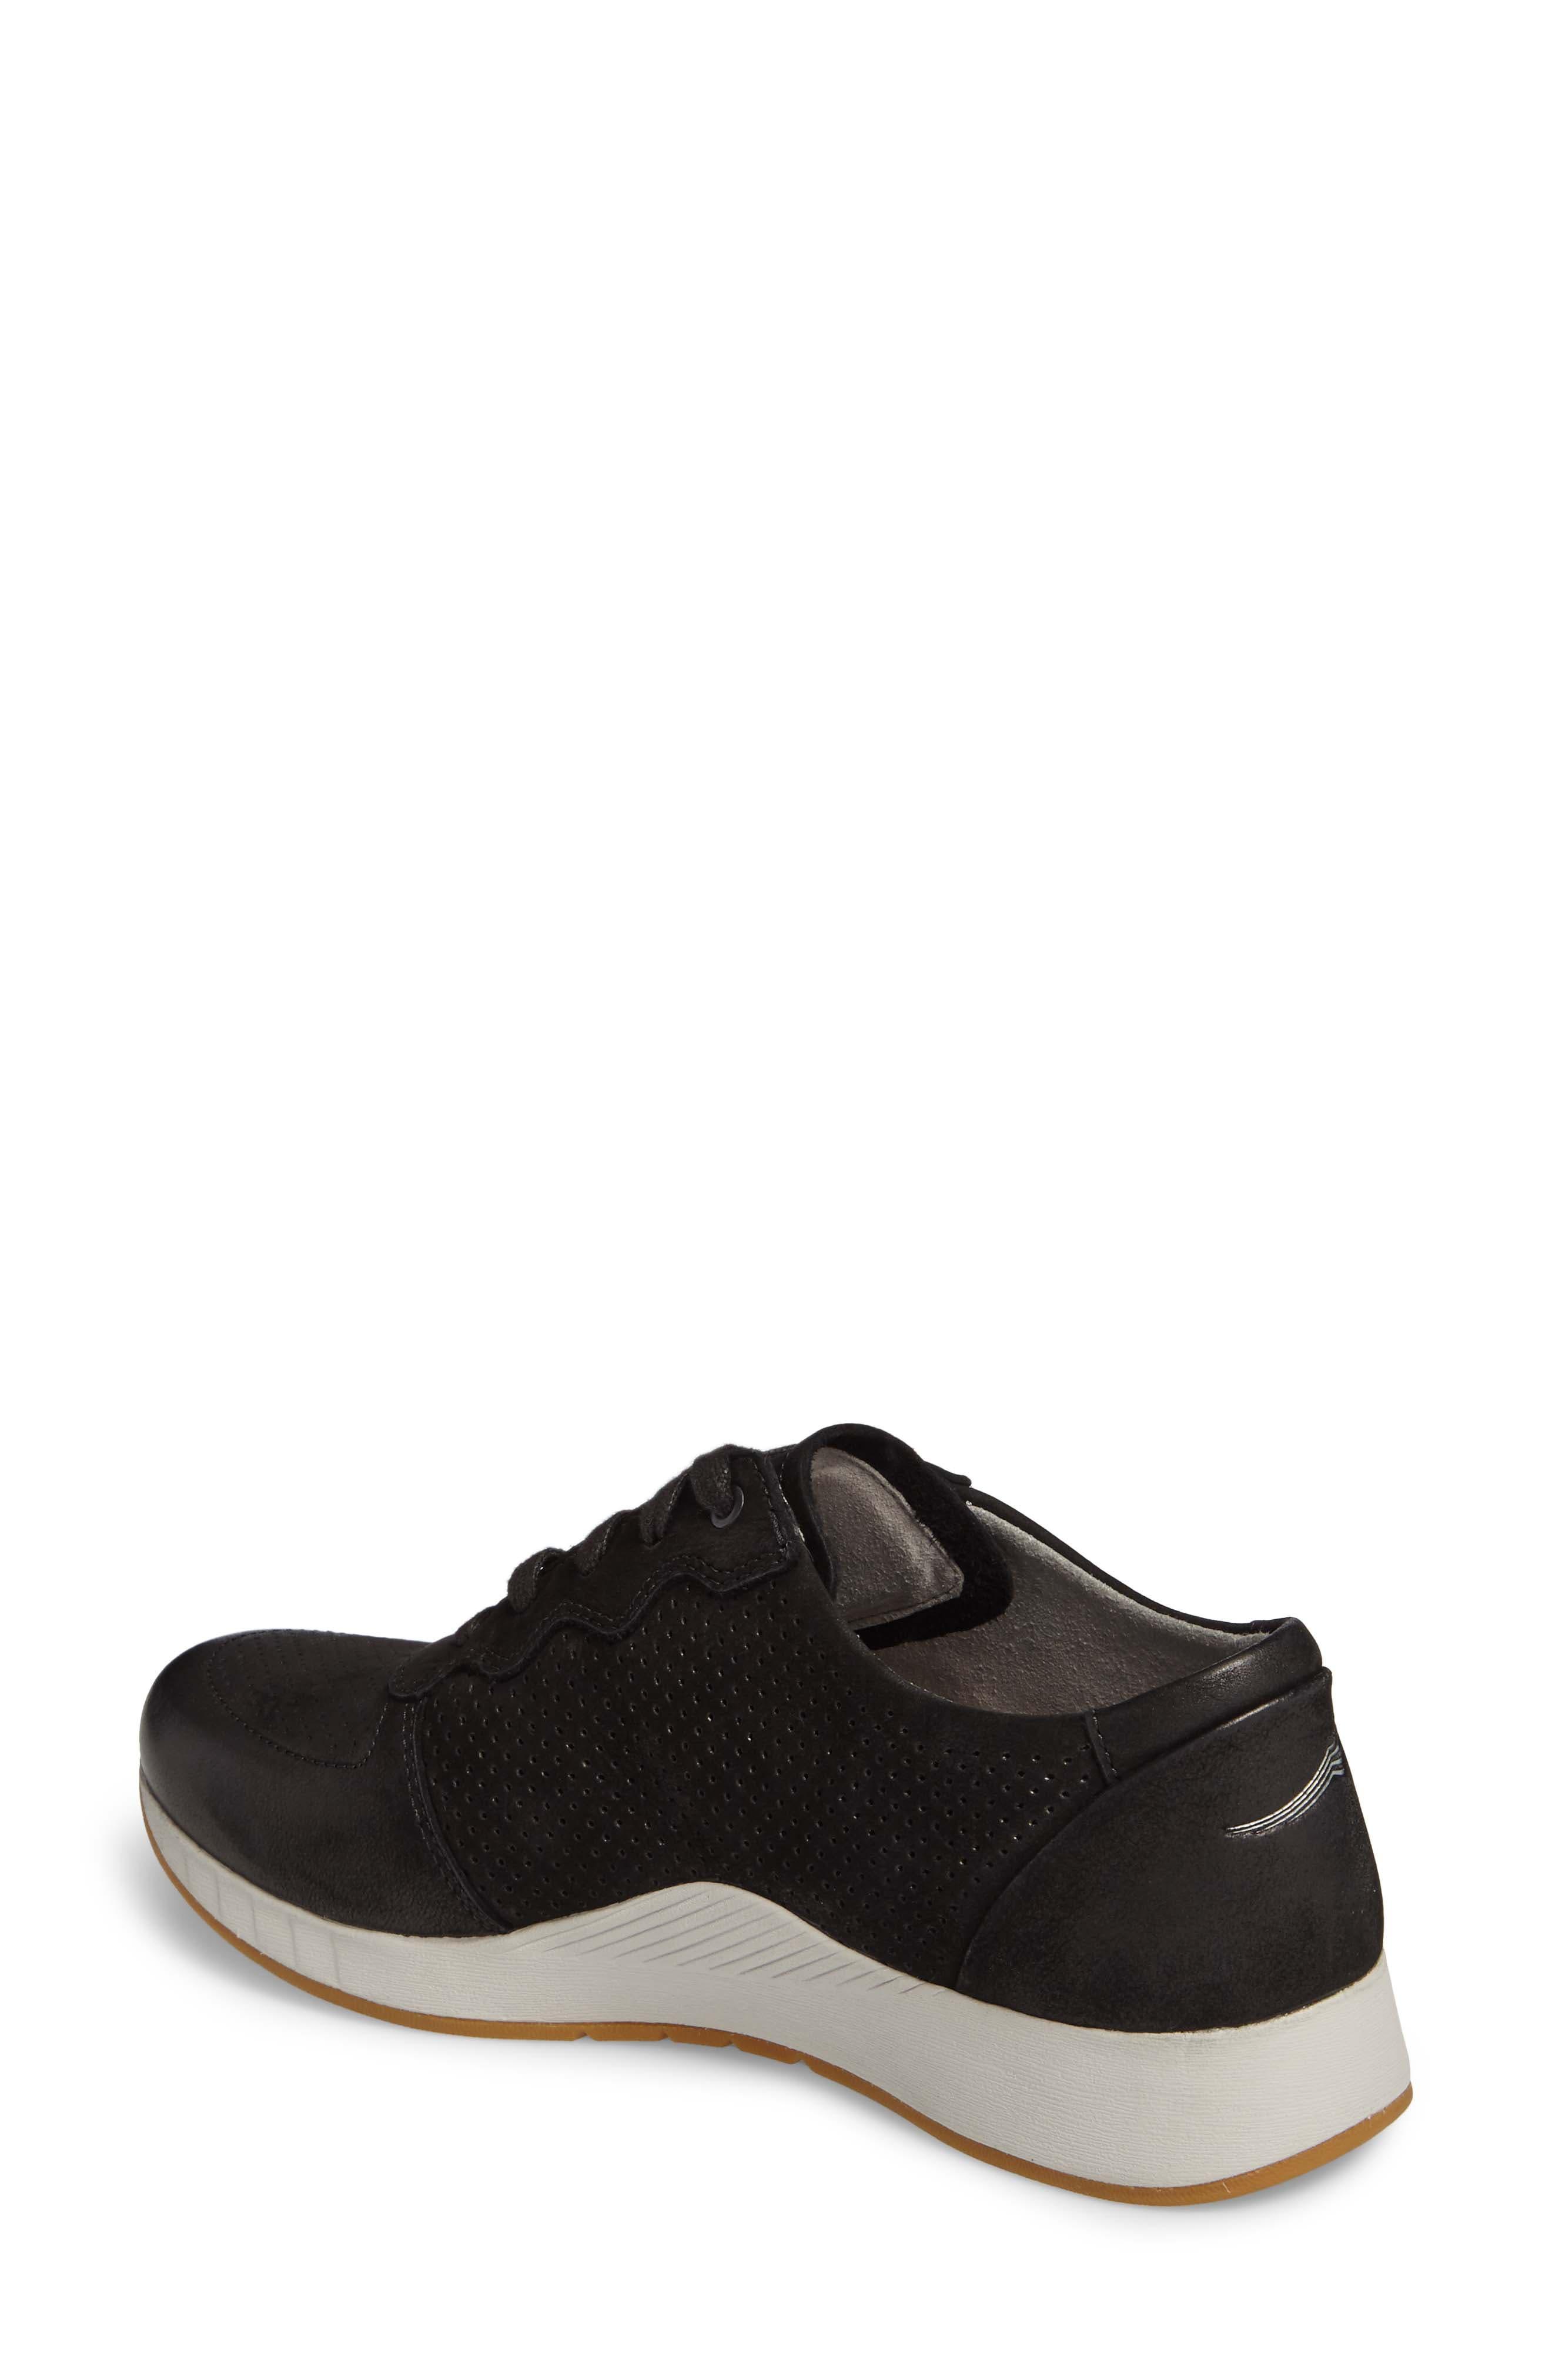 Christina Sneaker,                             Alternate thumbnail 2, color,                             Black Nubuck Leather